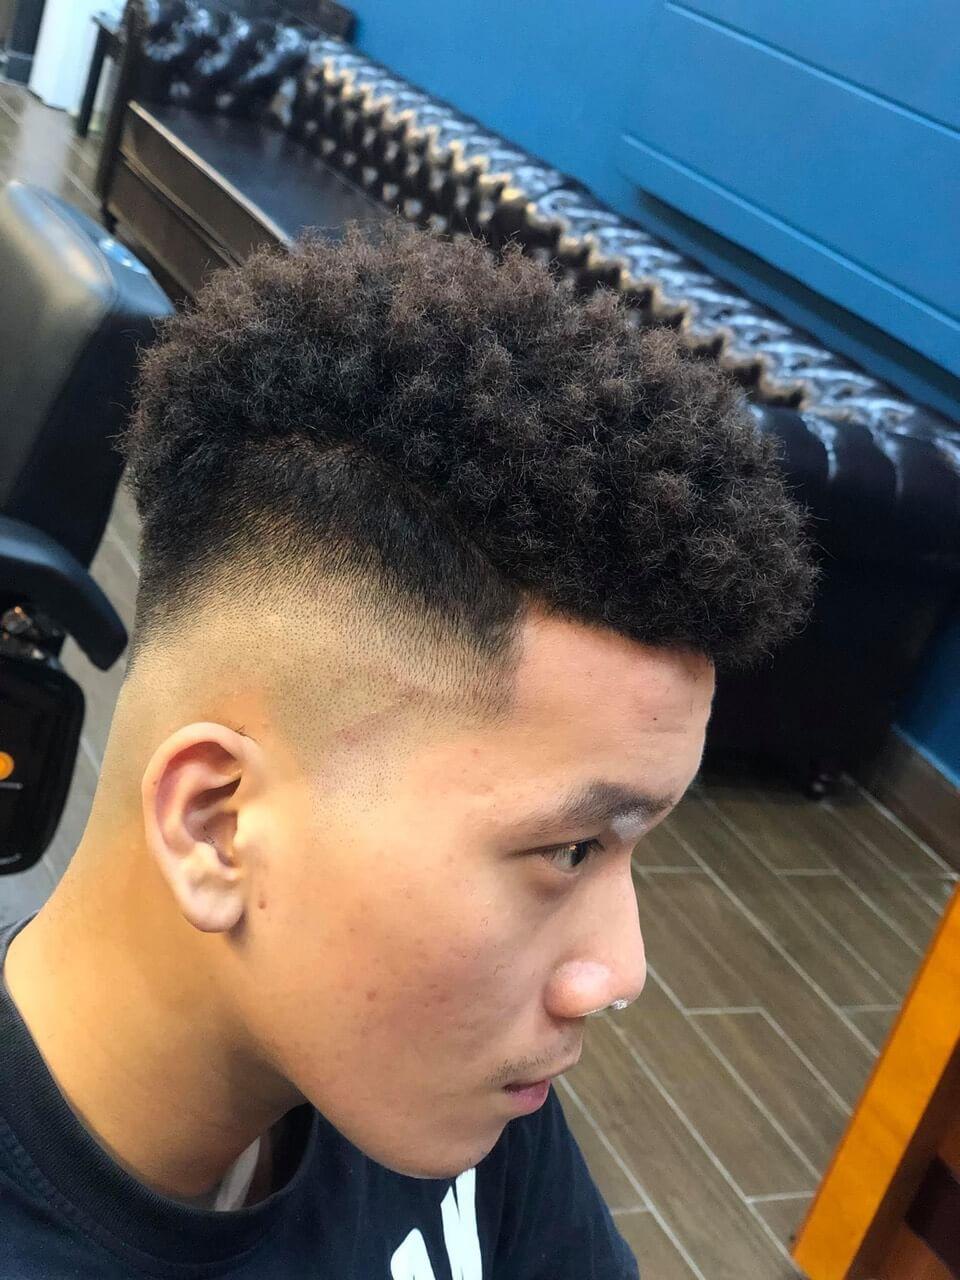 Kiểu uốn tóc nam Premlock